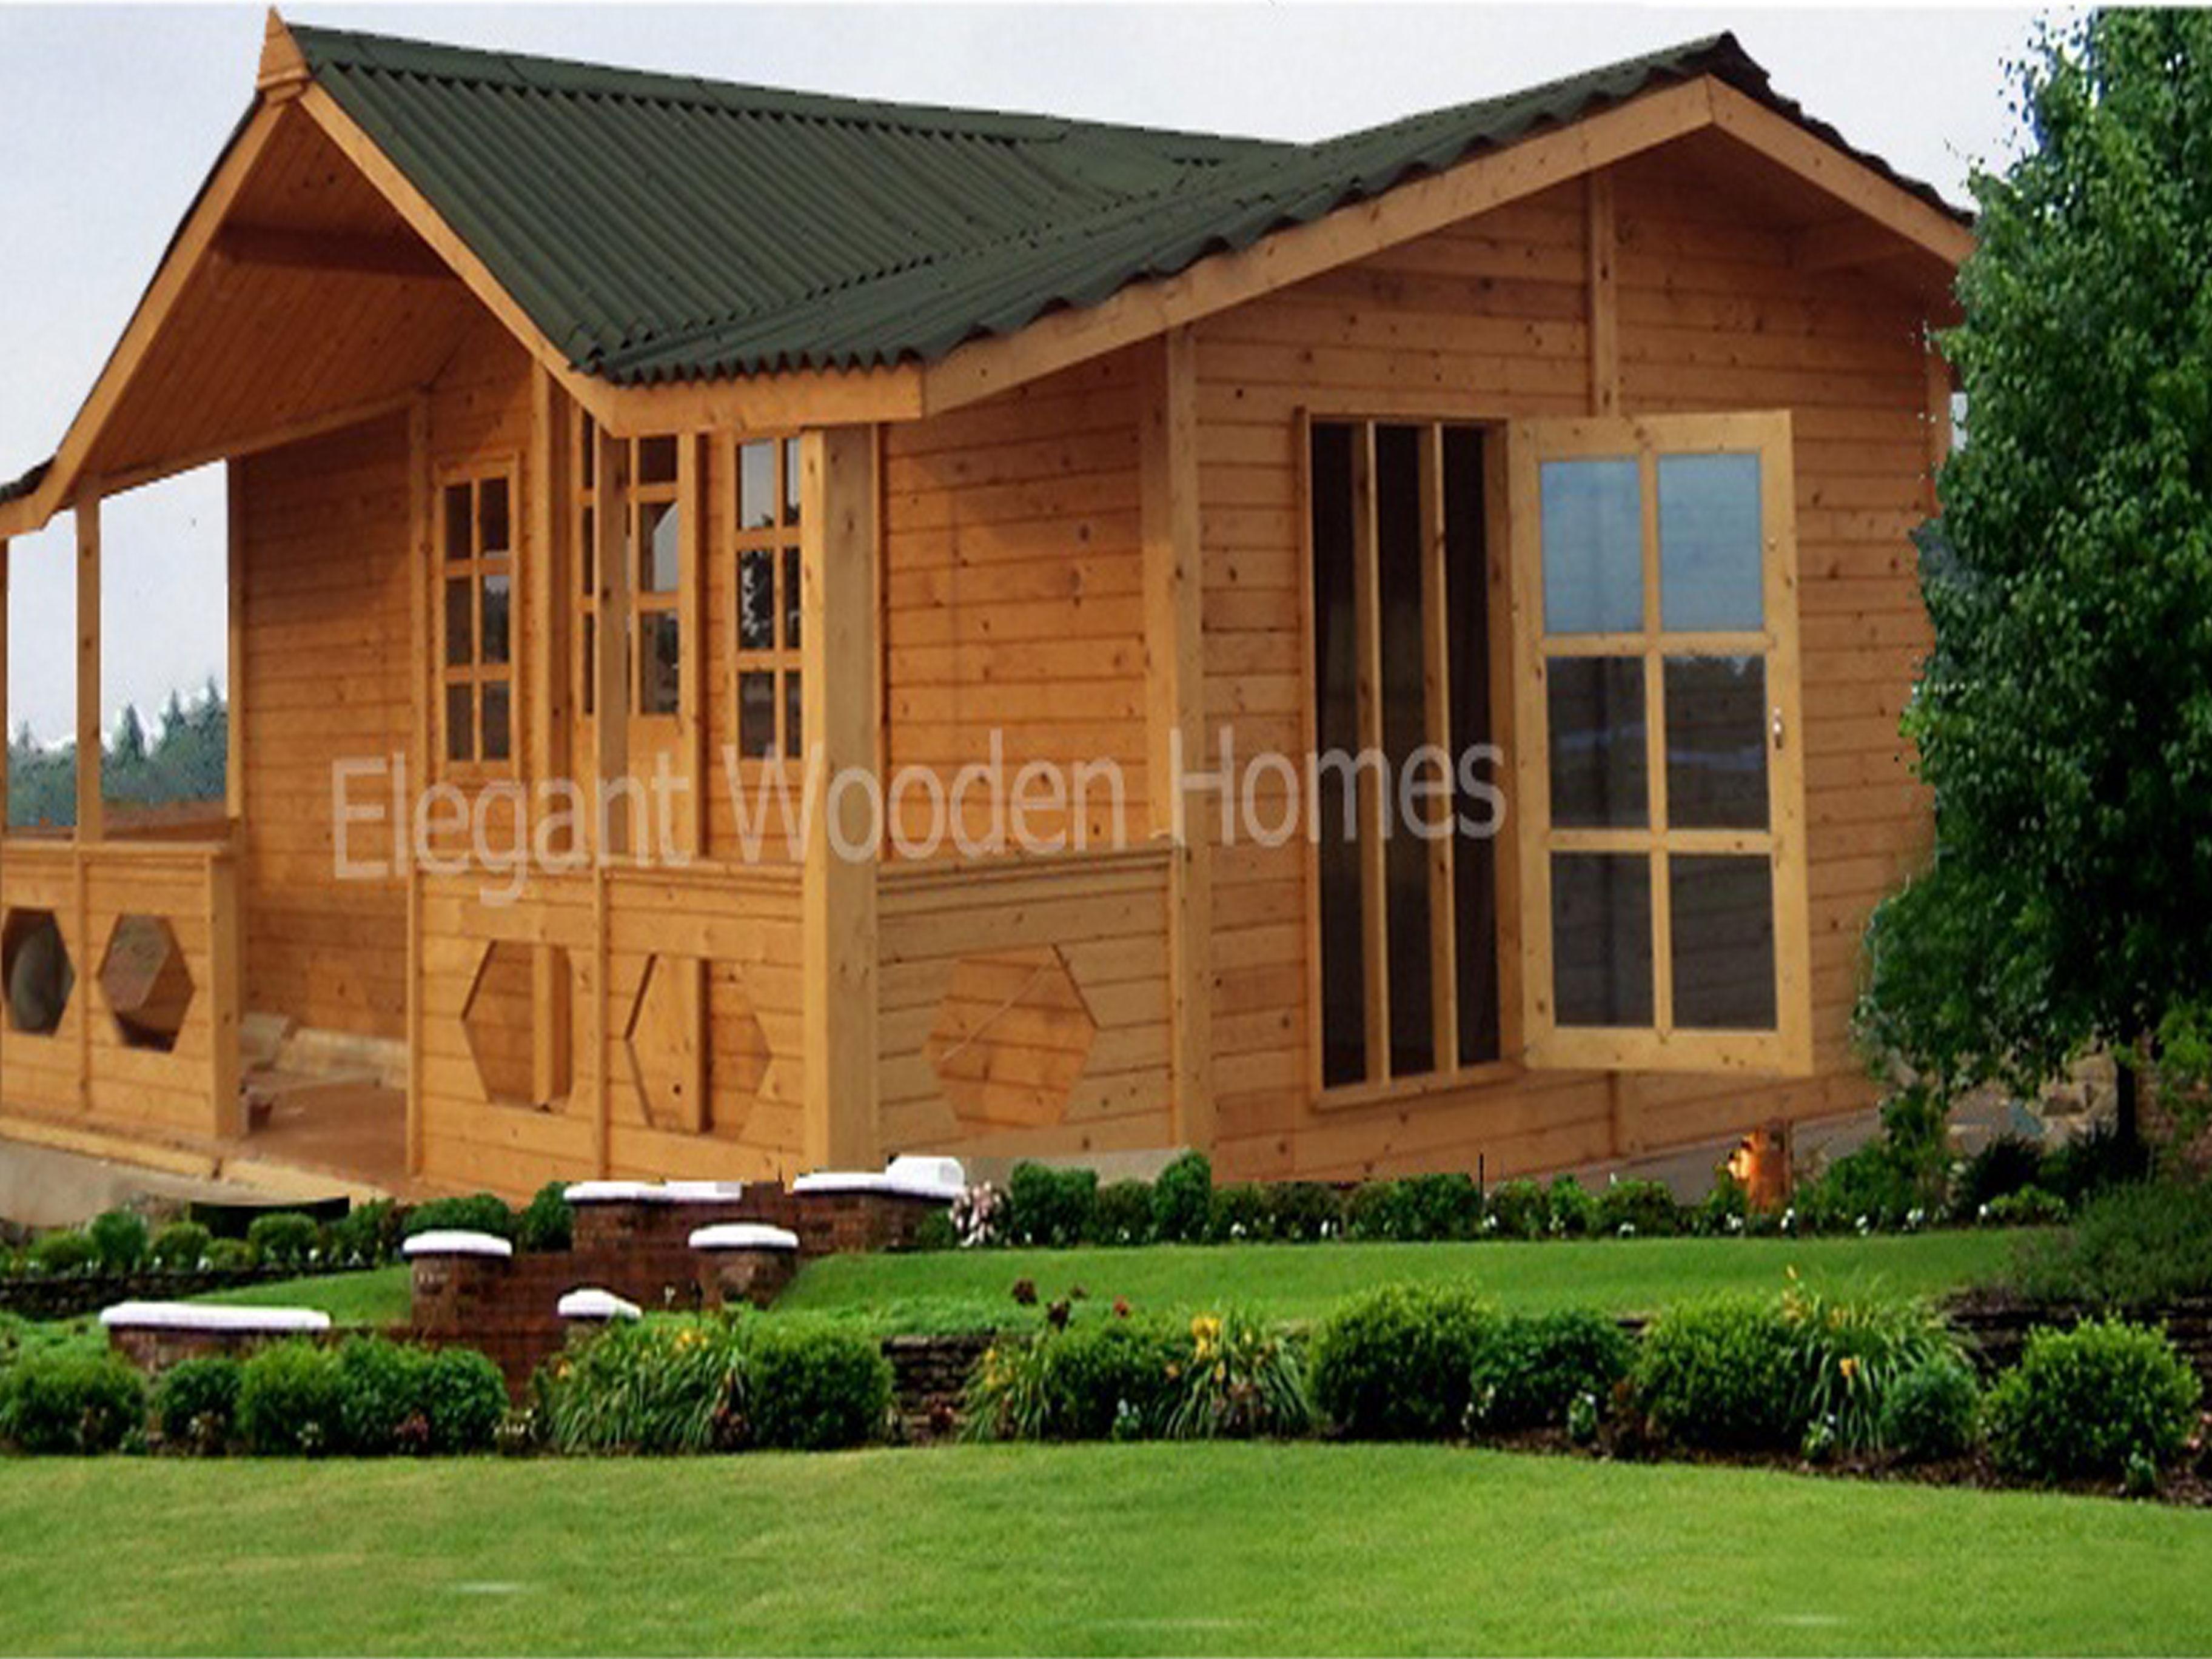 Elegant Wooden Homes Wooden Cottages Wooden Homes Wooden Houses